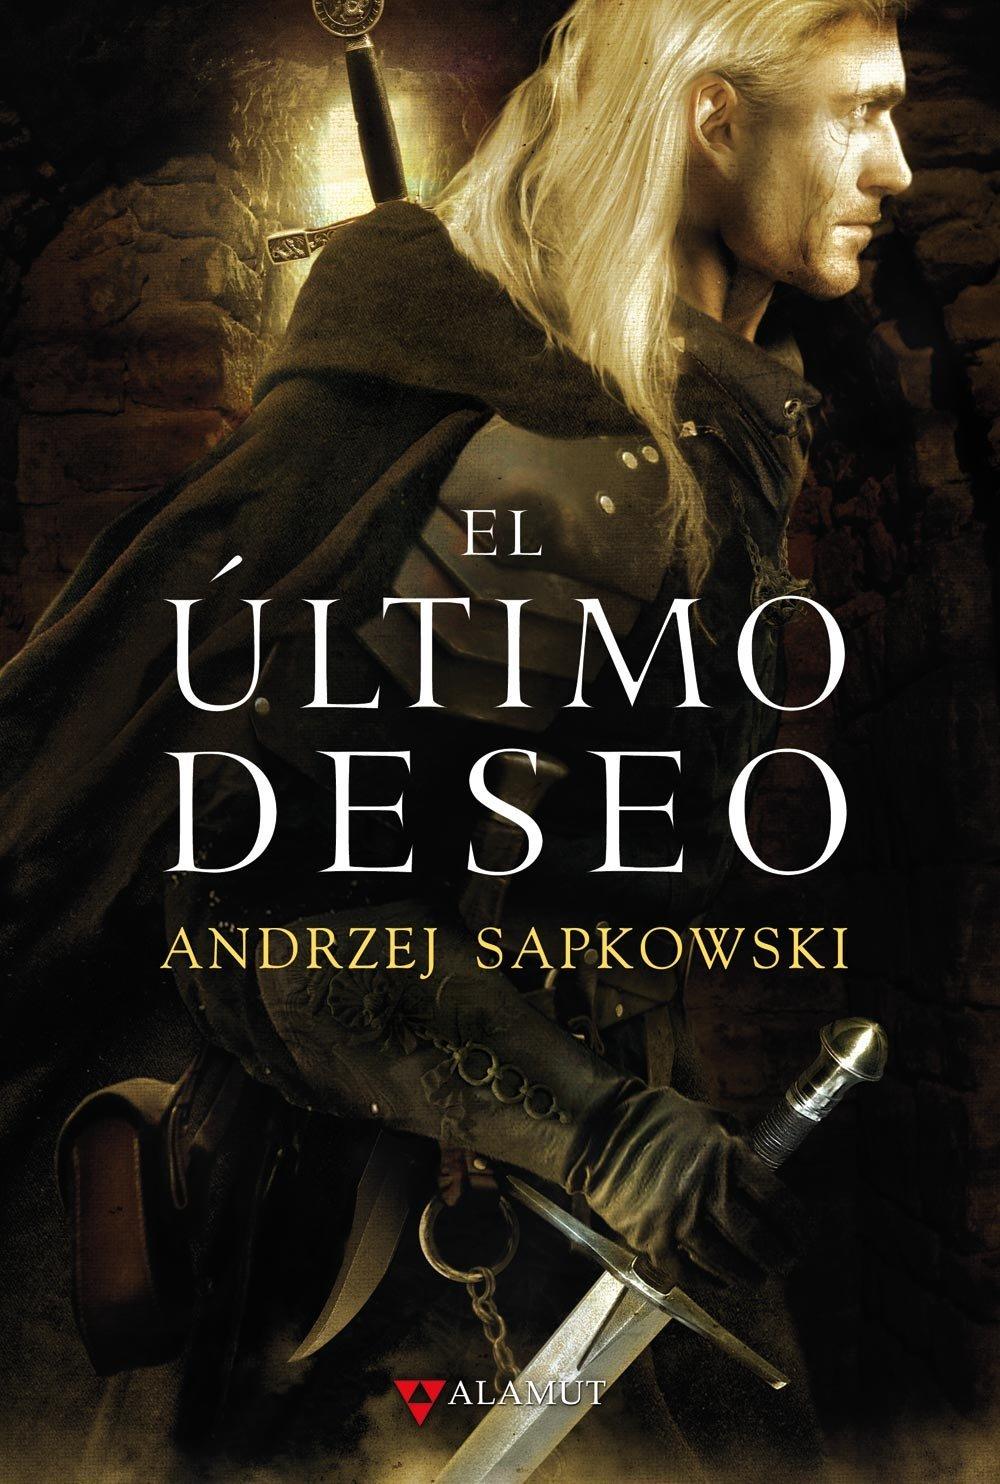 Sapkowski, Andrzej. El Último deseo